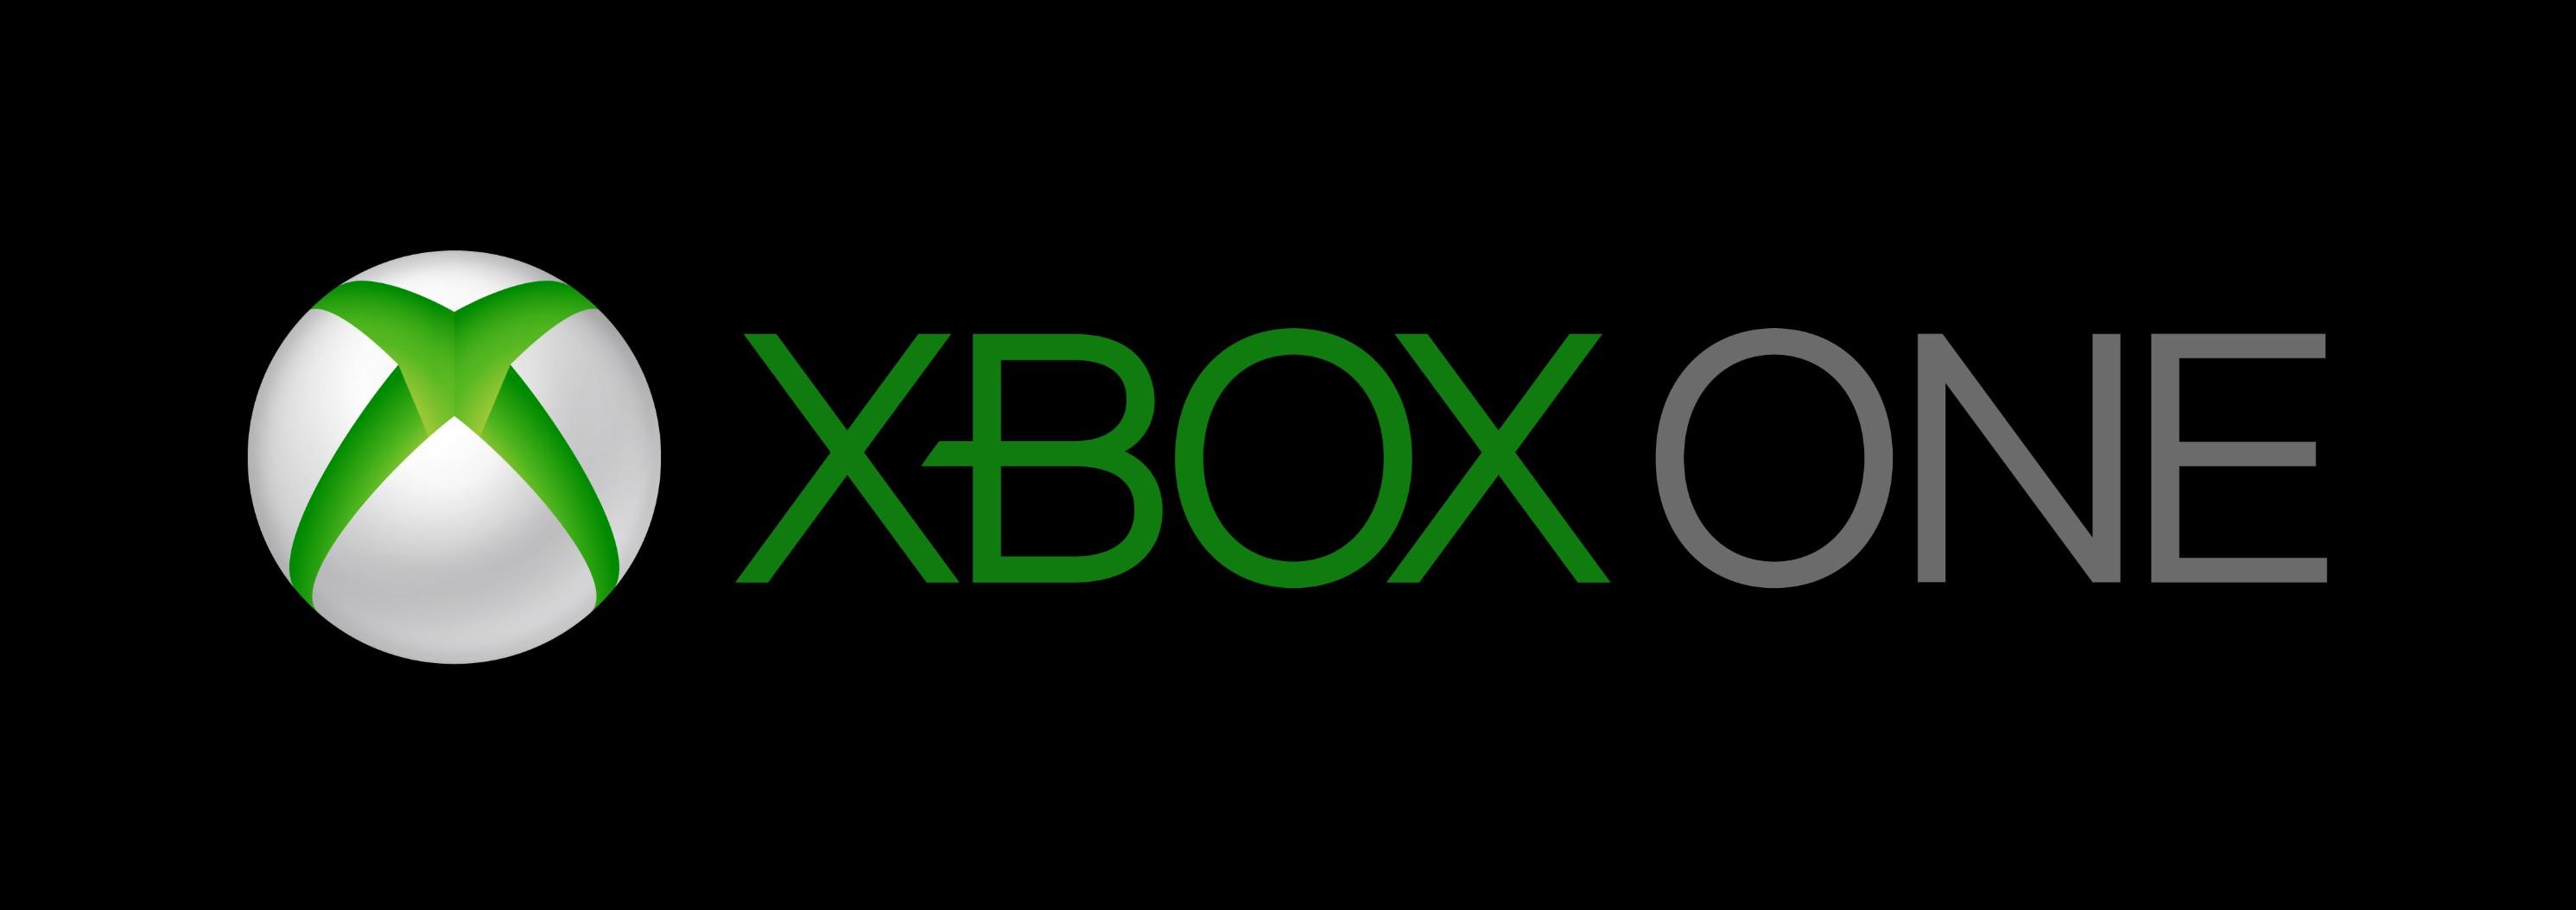 Xbox Video Logo Xbox One Logo - fluech...